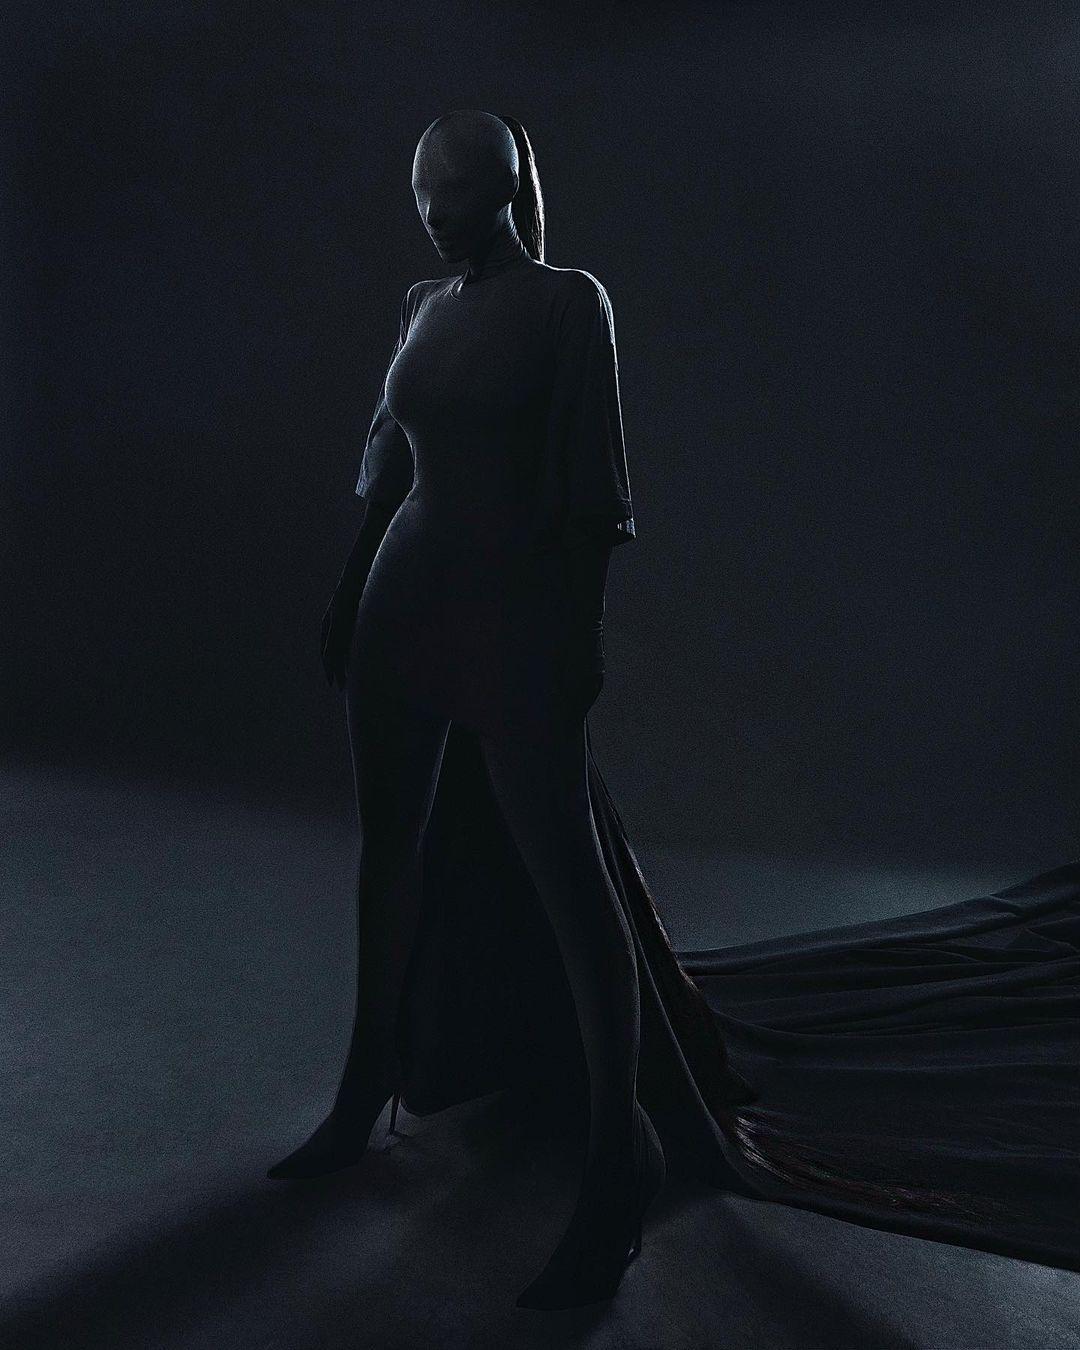 Met Gala 2021: Образ Ким Кардашьян – total-look и модная маска-Фото 2